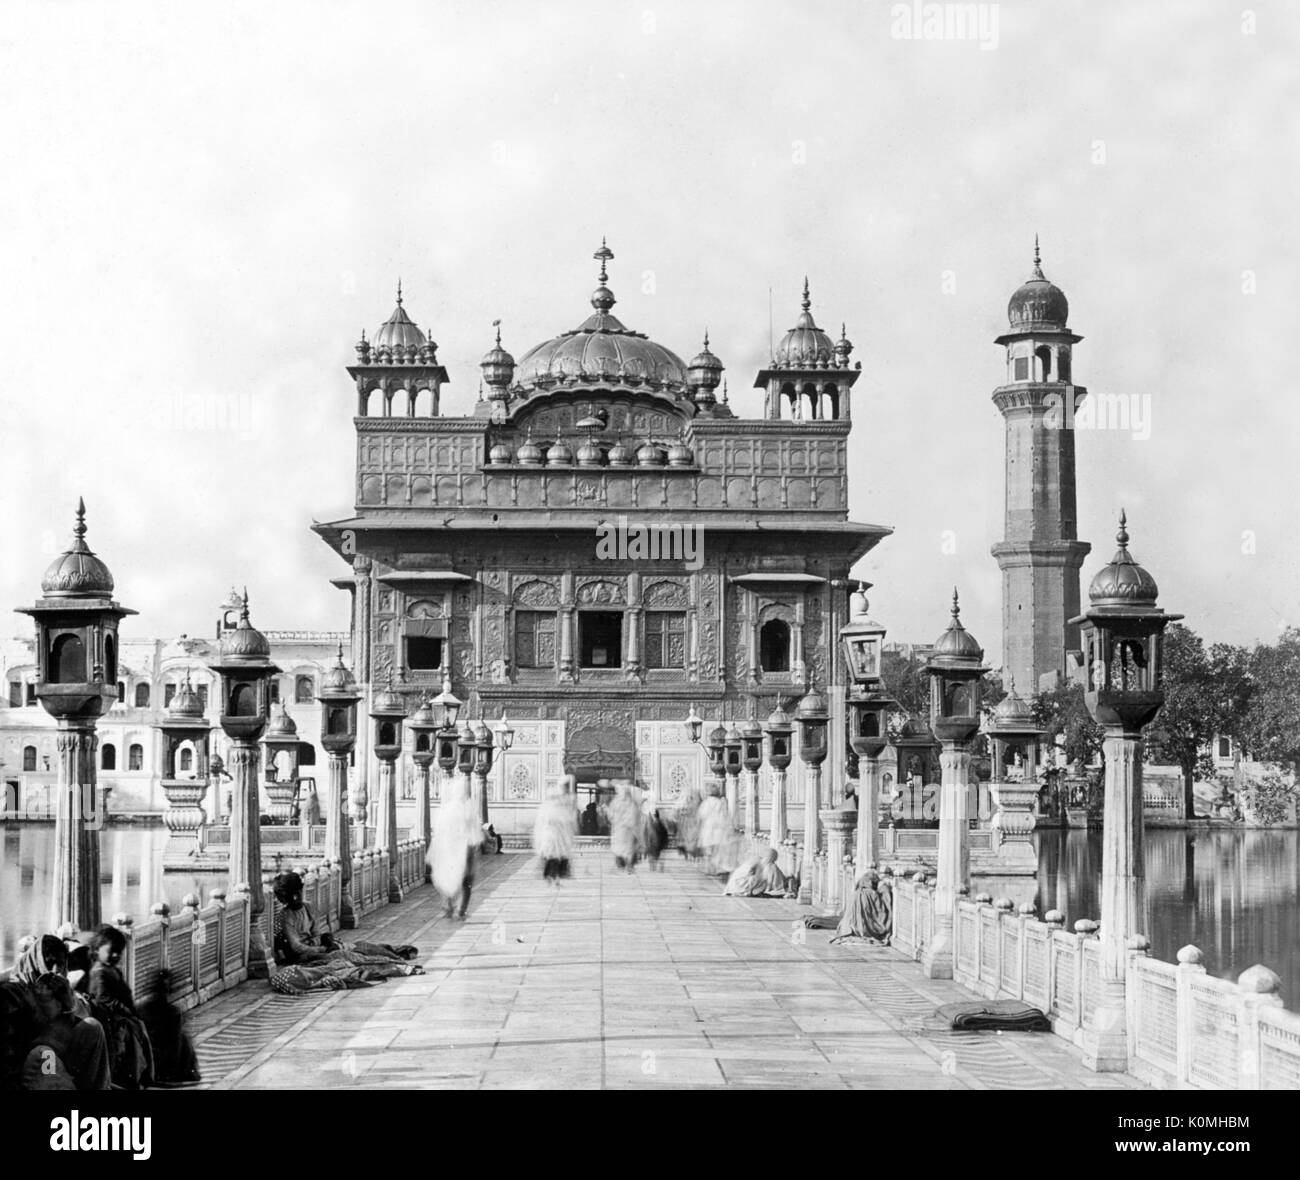 Old vintage lantern slide of golden temple, Amritsar, Punjab, India, Asia, 1800s - Stock Image